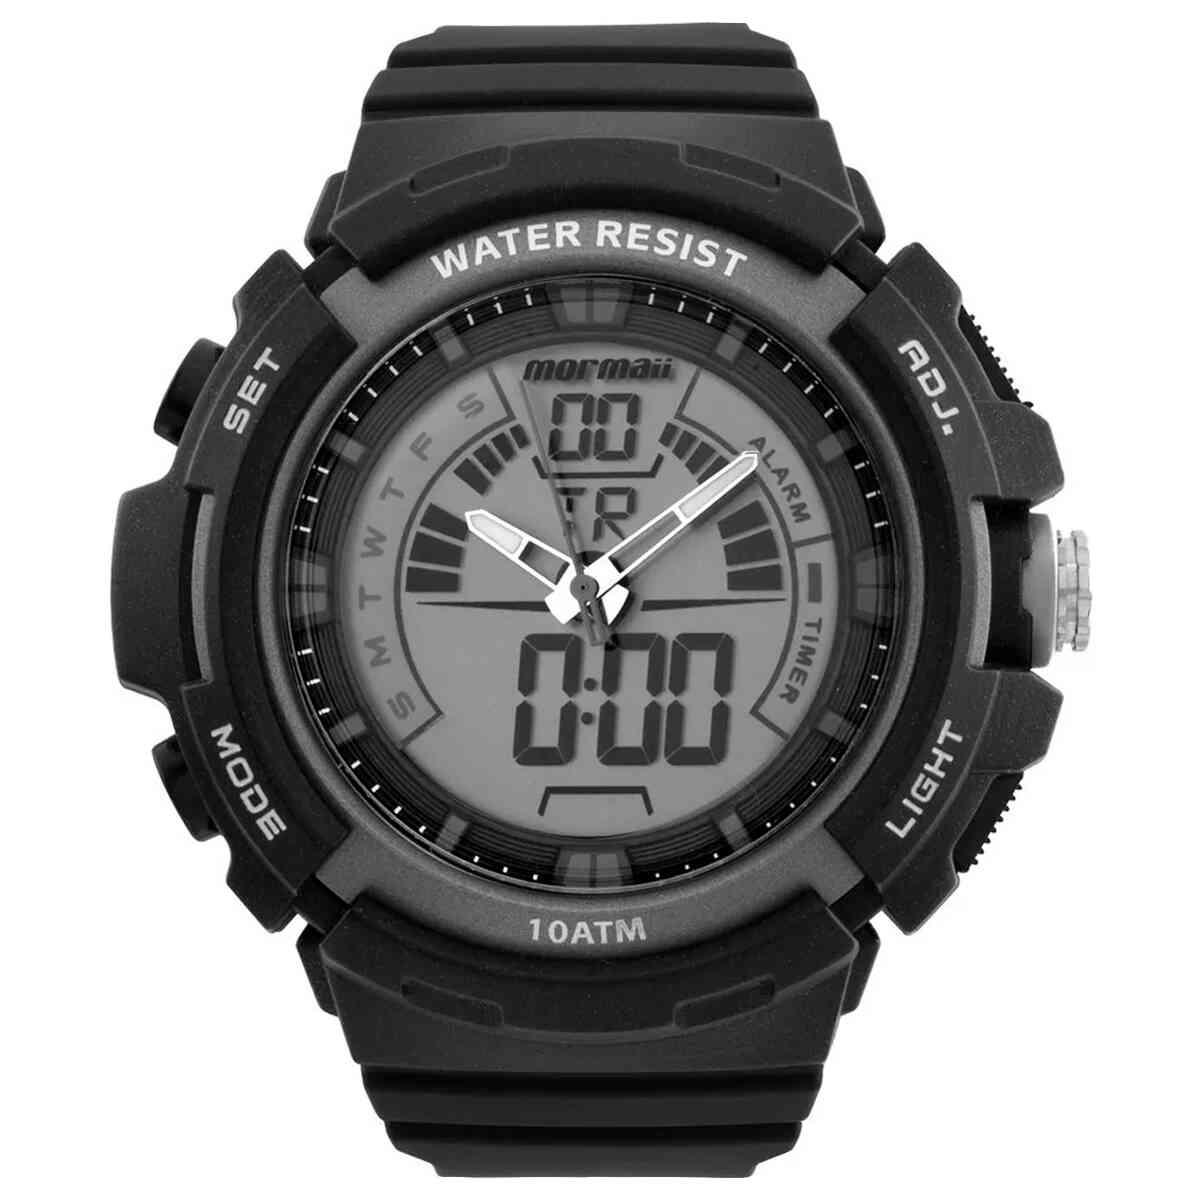 Relógio de Pulso Mormaii Wave Ana/Digi Masculino MOAD08902